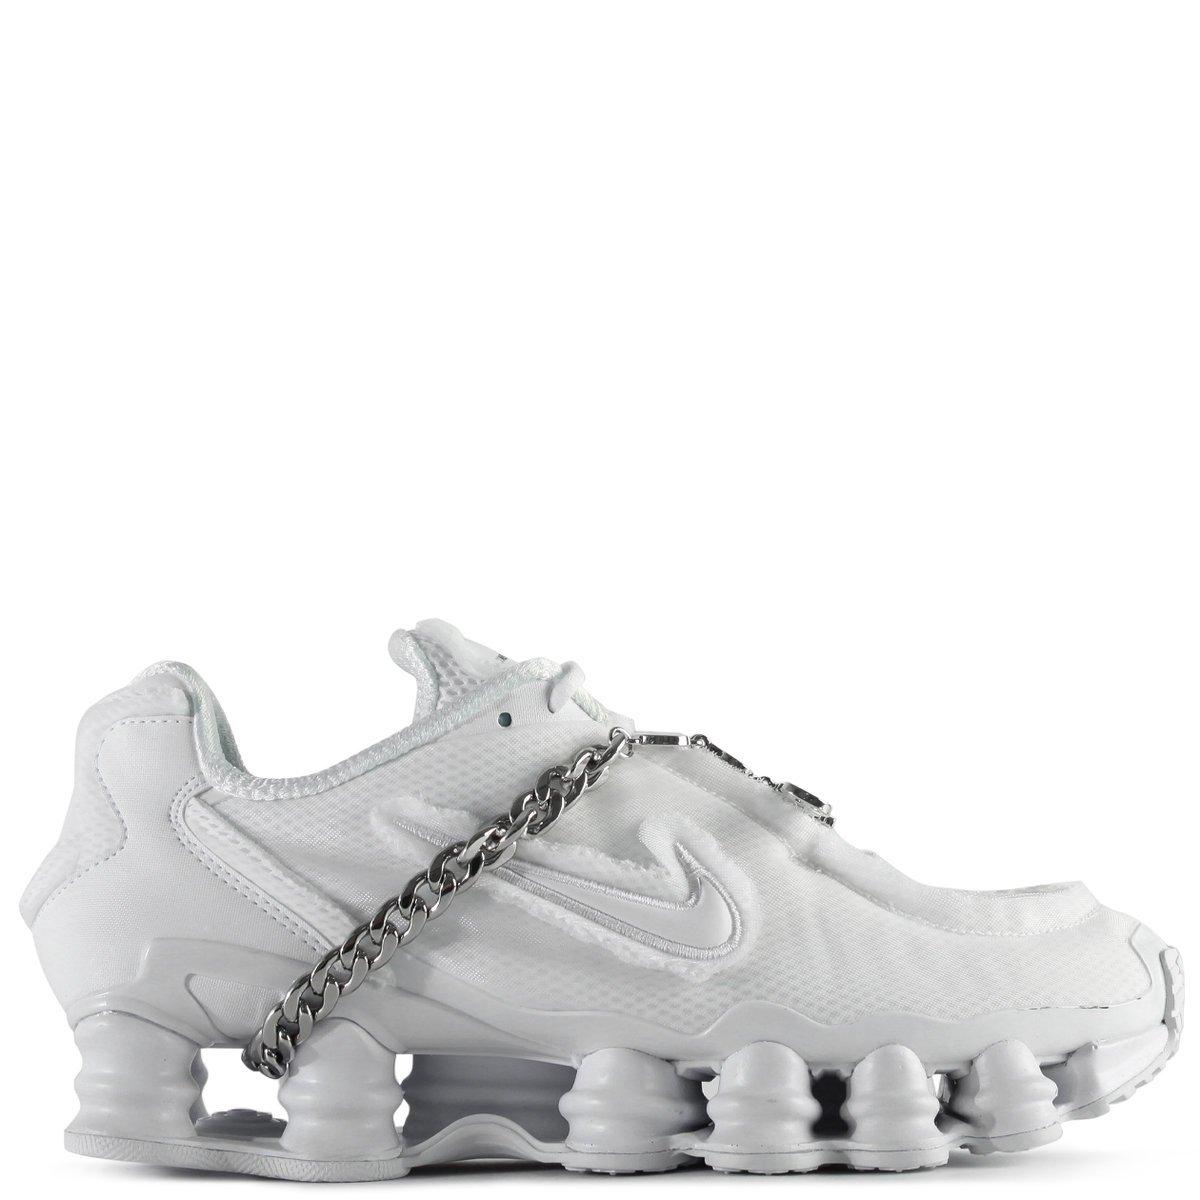 x Nike Shox TL Sneakers White